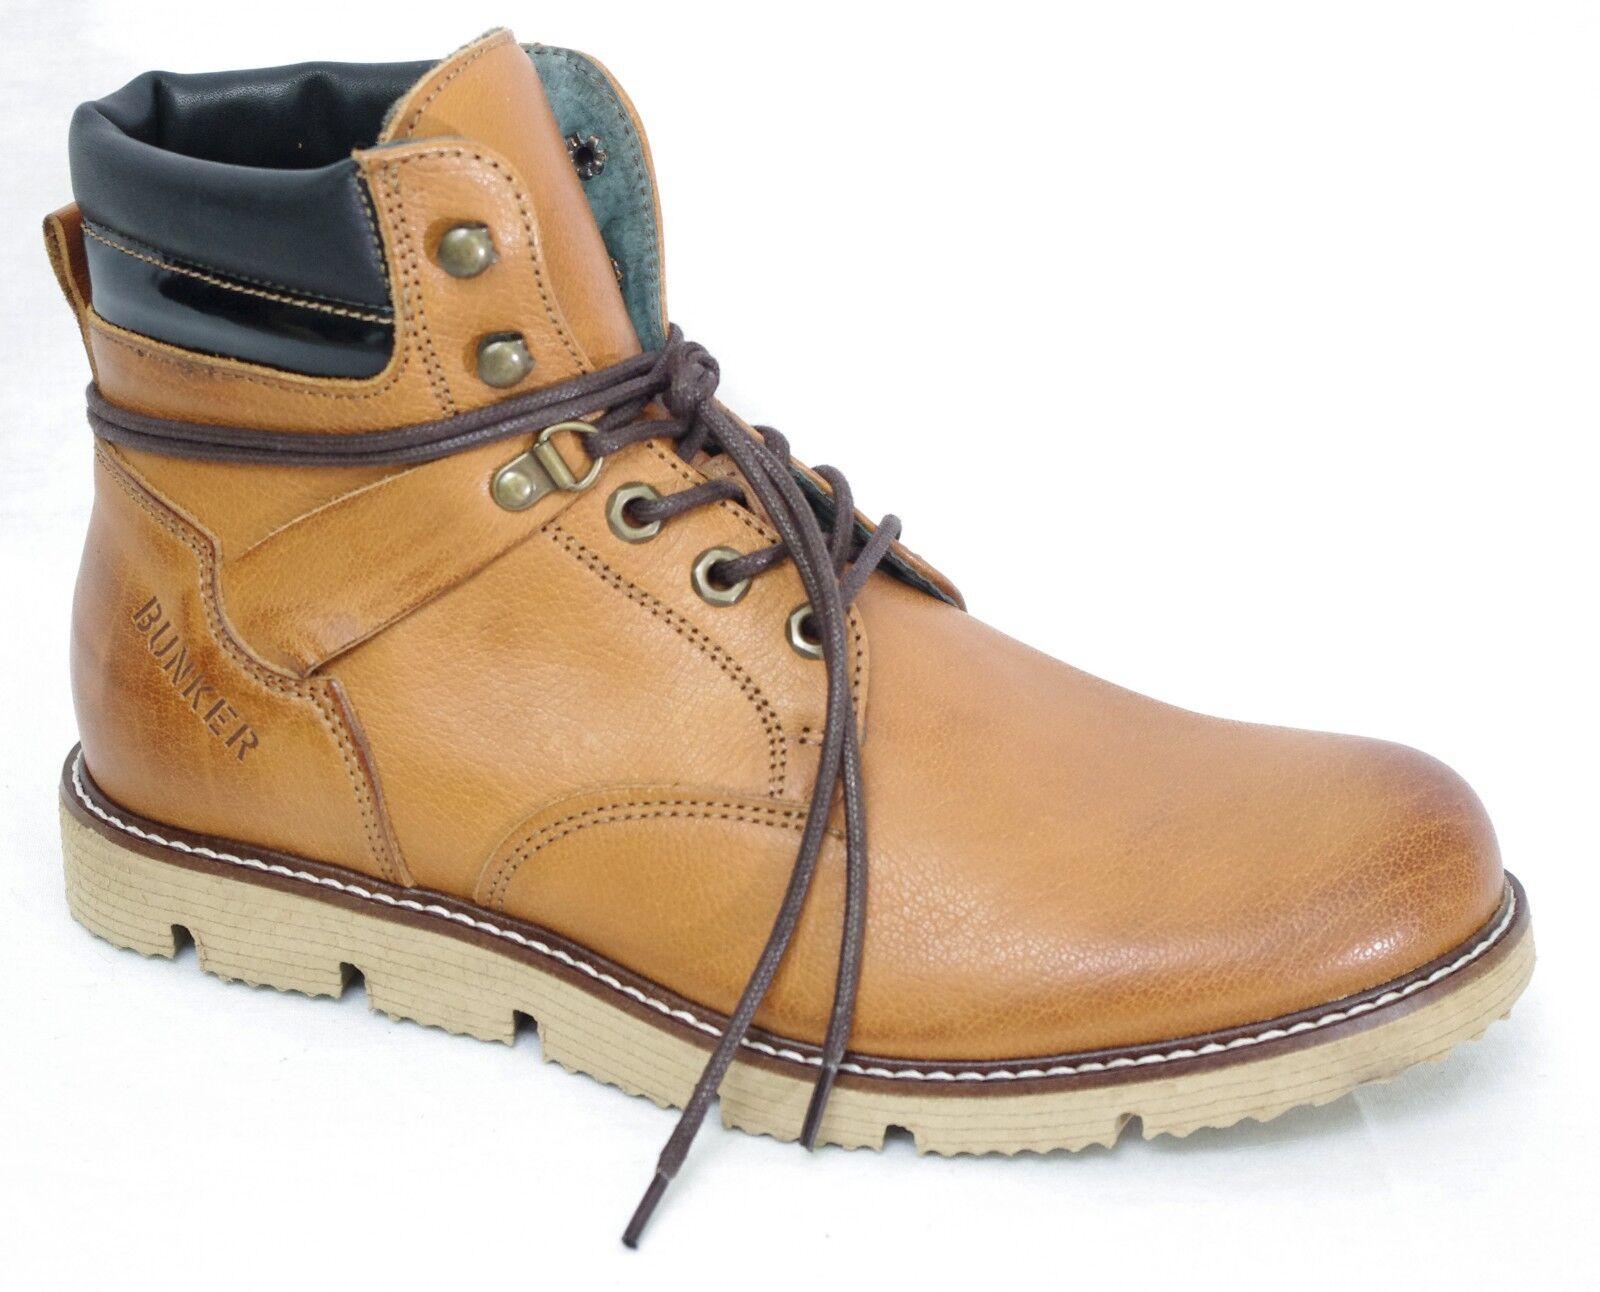 c295280d0f BUNKER B982 TR7 chaussures Boots cuir marron homme Hyper légeres | eBay